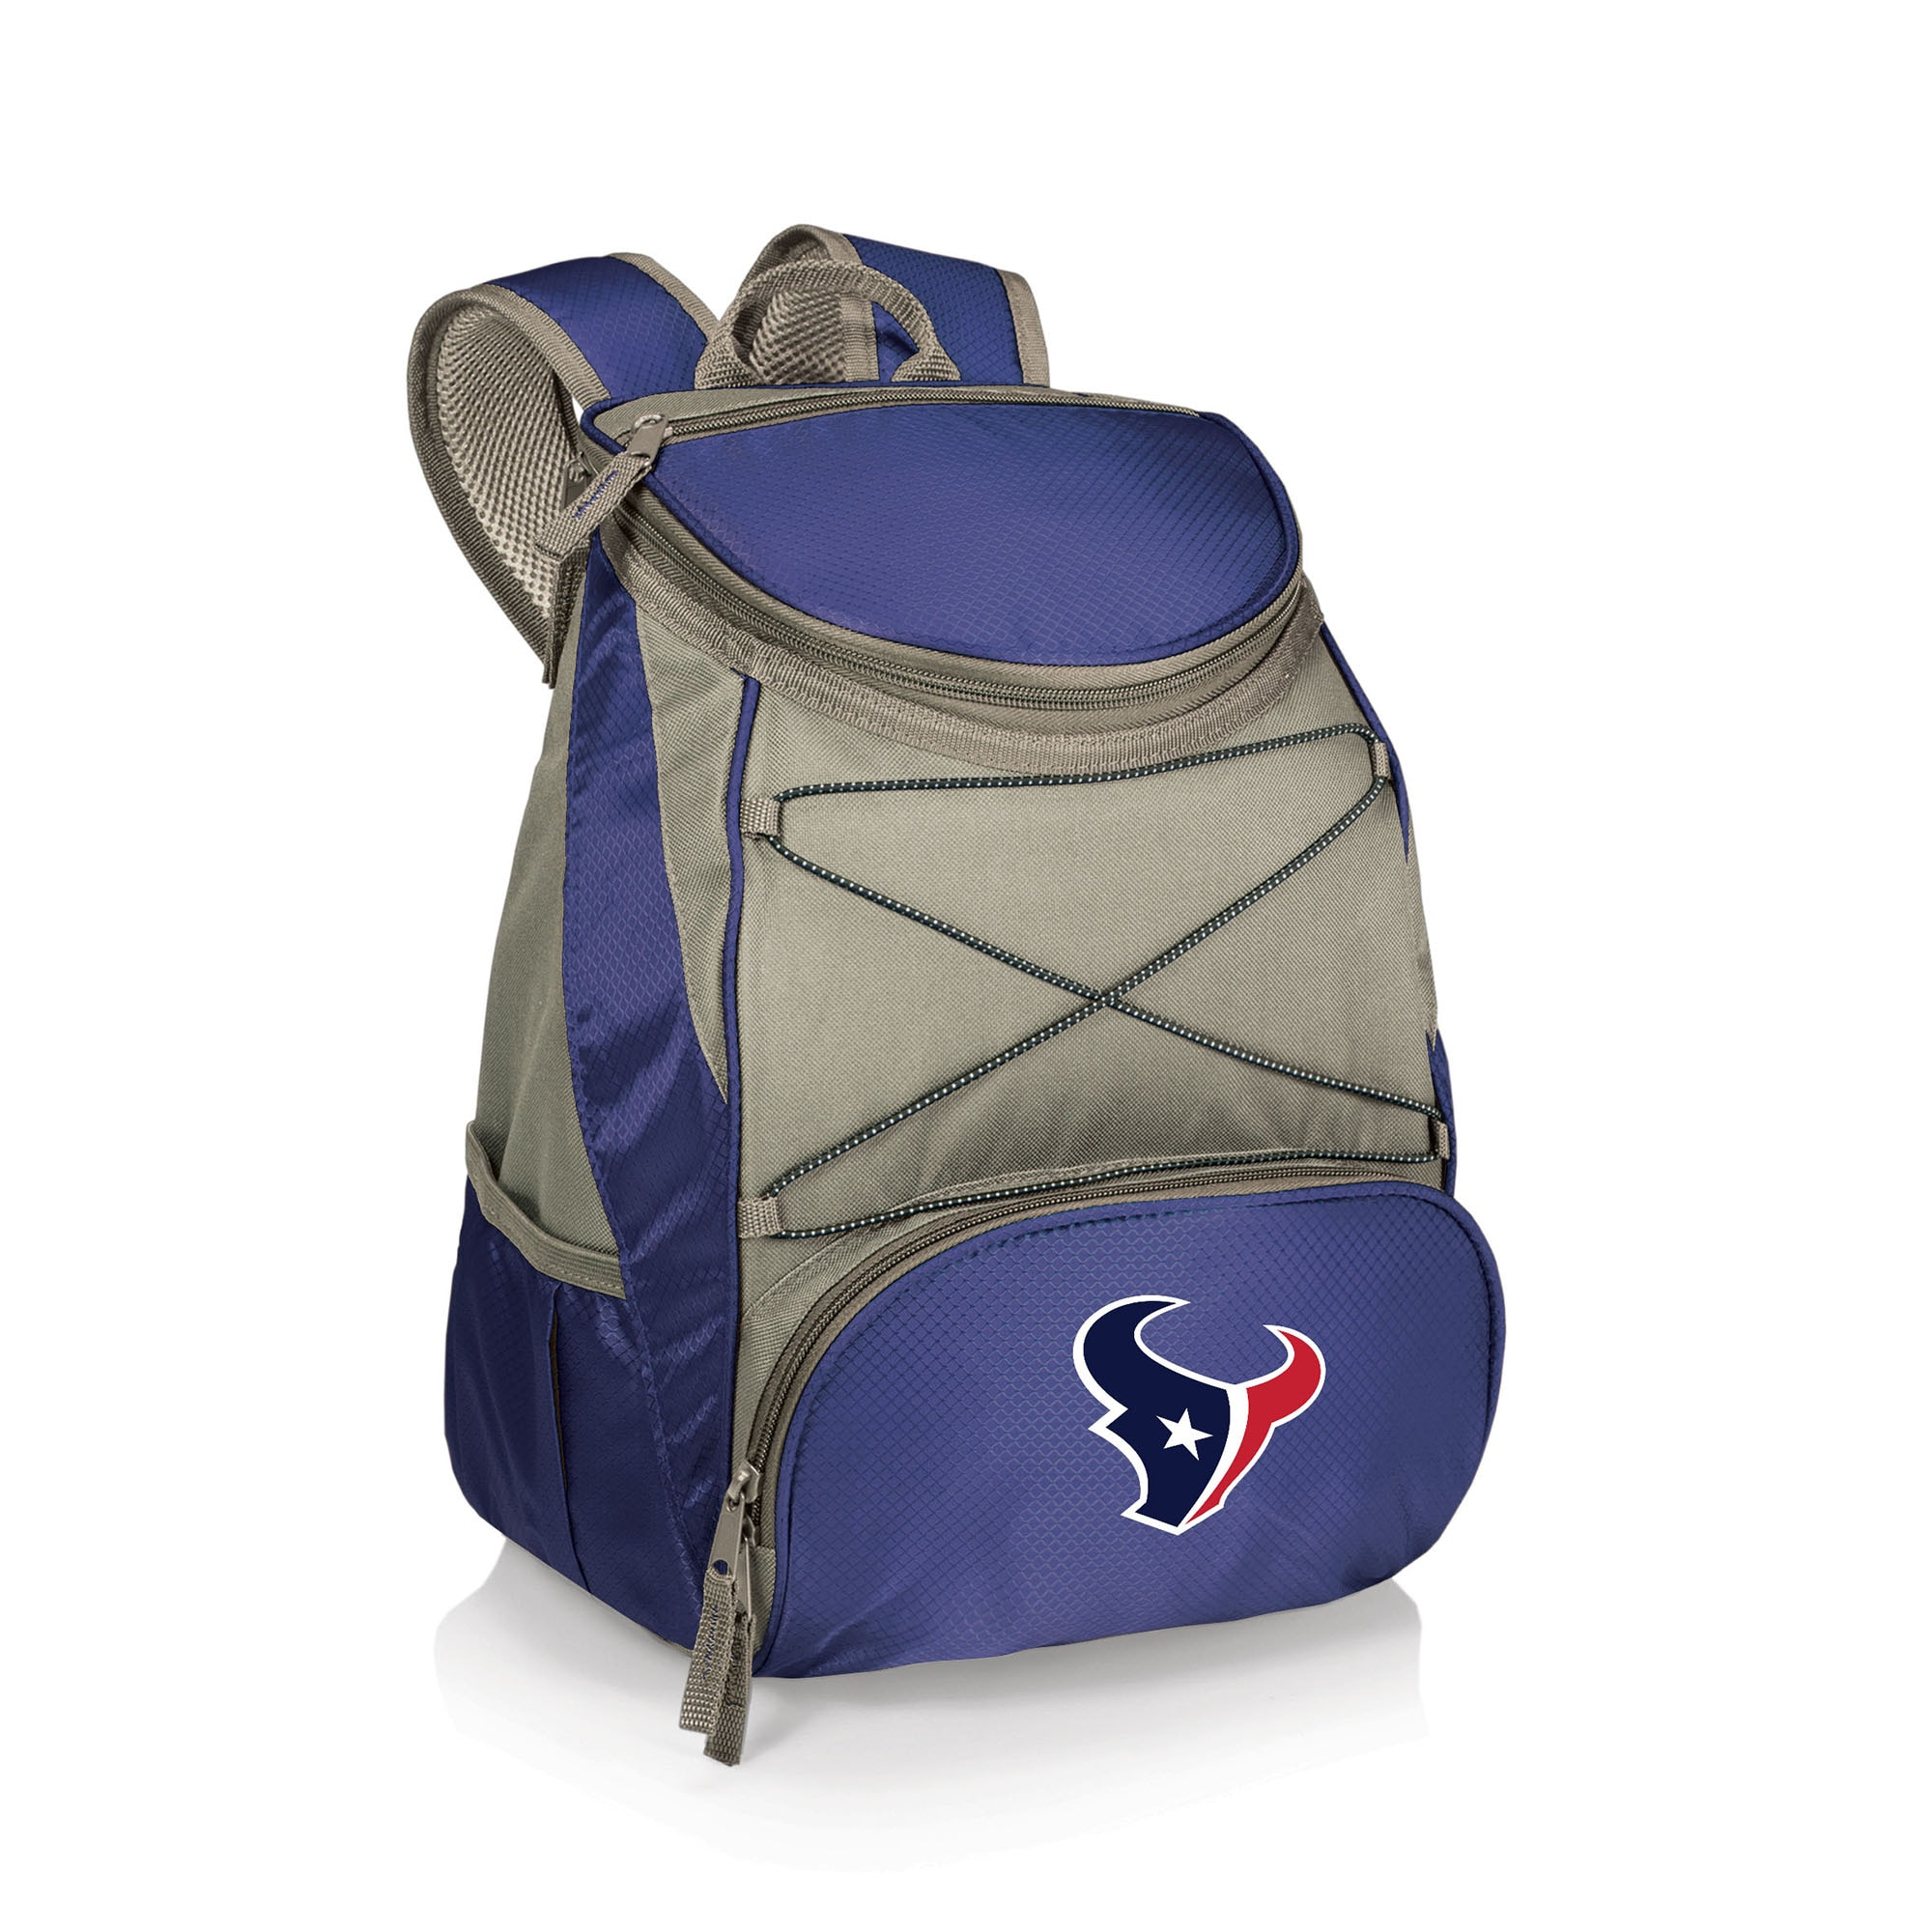 Houston Texans PTX Backpack Cooler - Navy